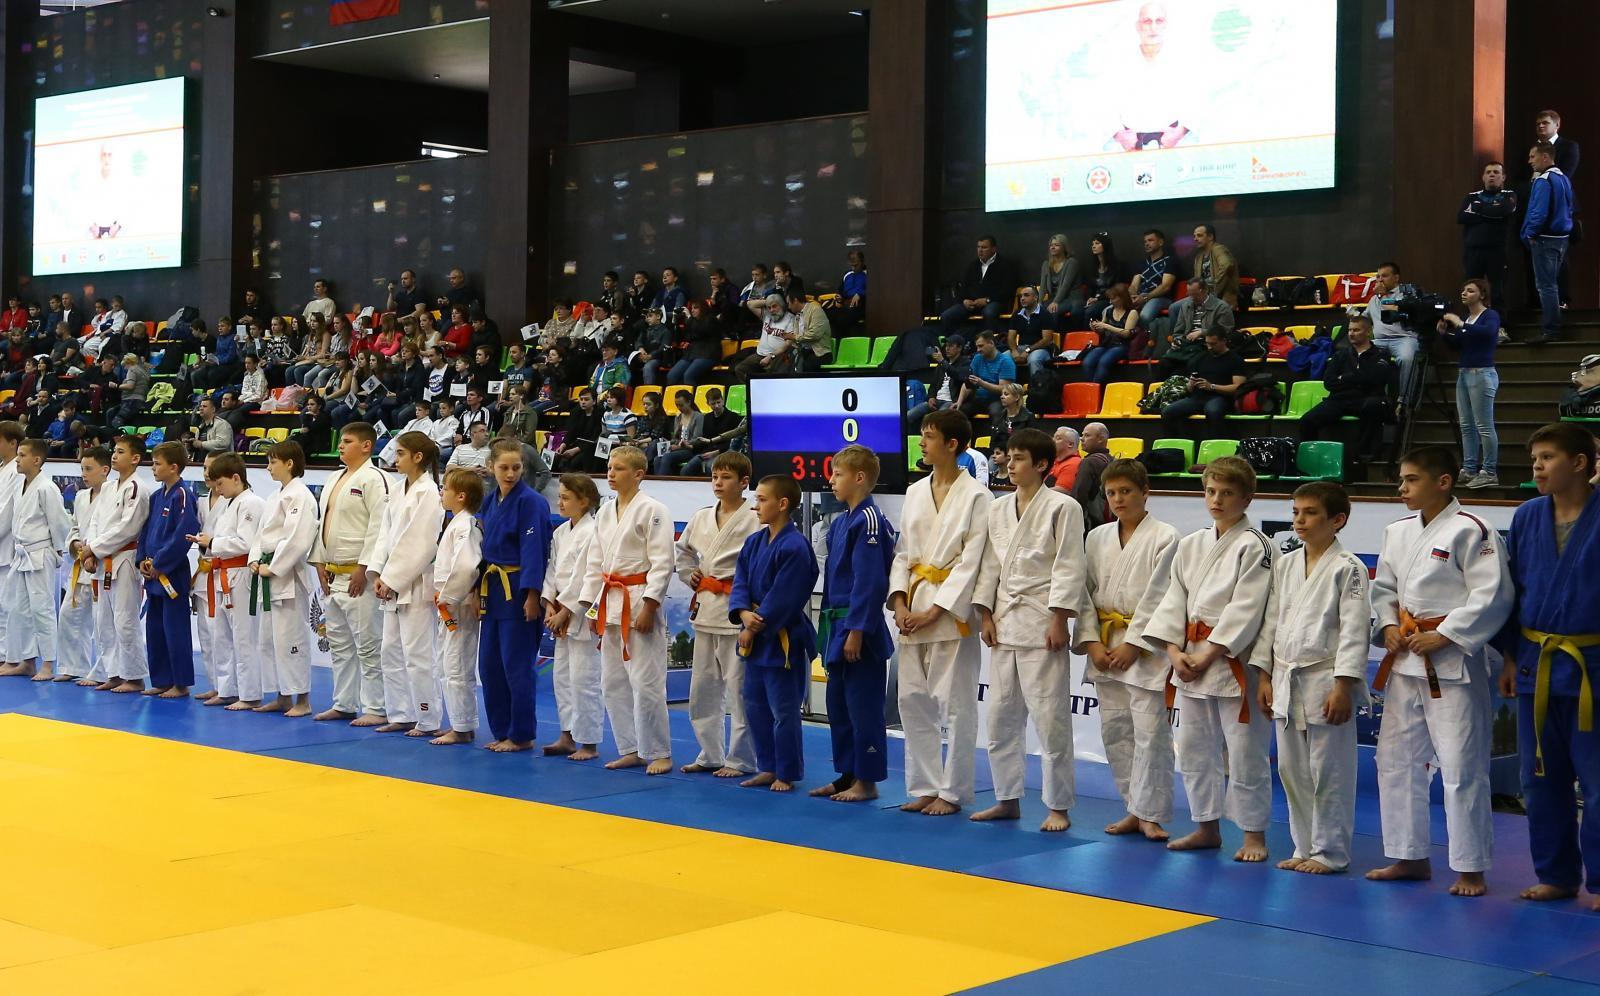 Владимир Путин направил приветствие участникам турнира подзюдо памяти Анатолия Рахлина